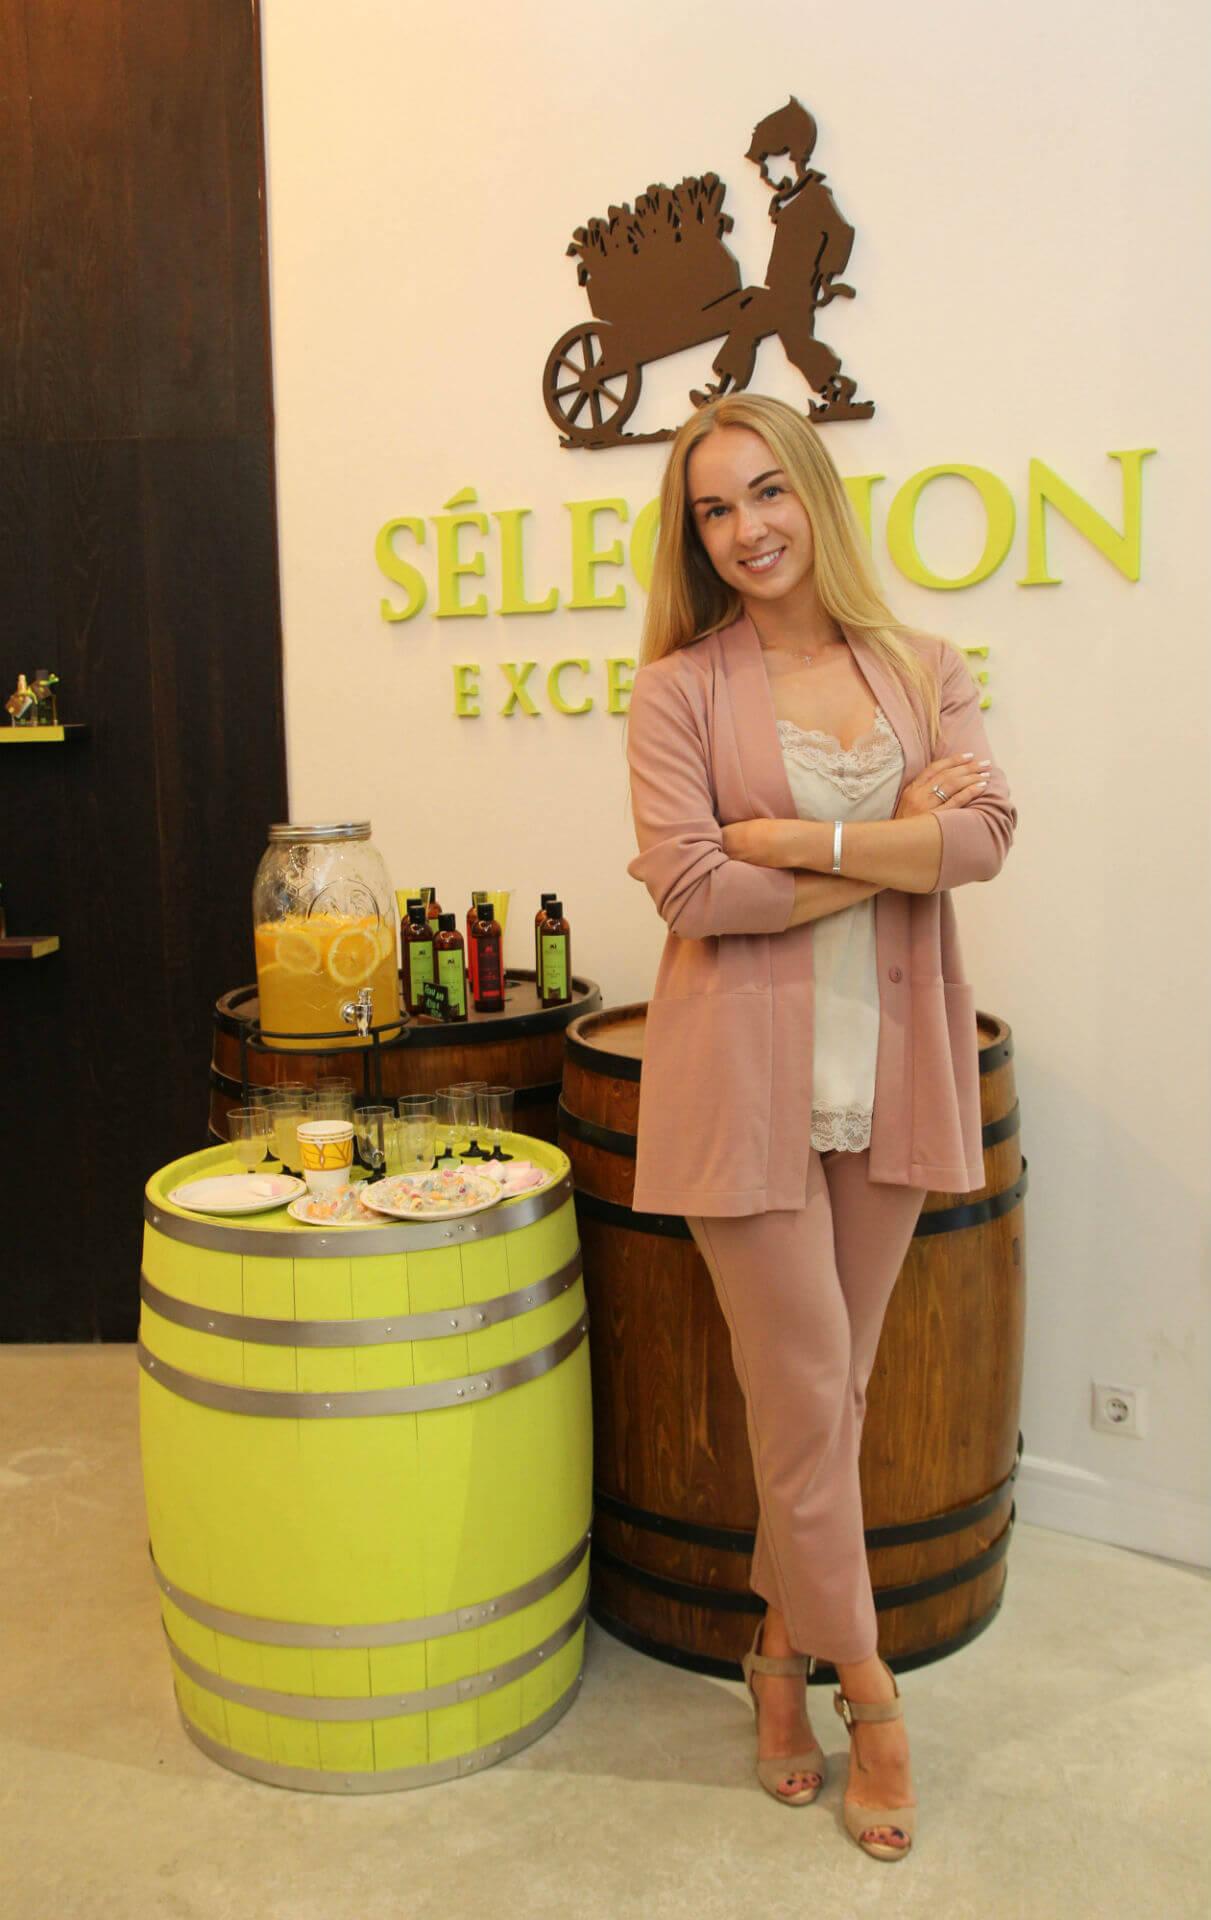 Основатель марки Selection Excellence Маша Борисова